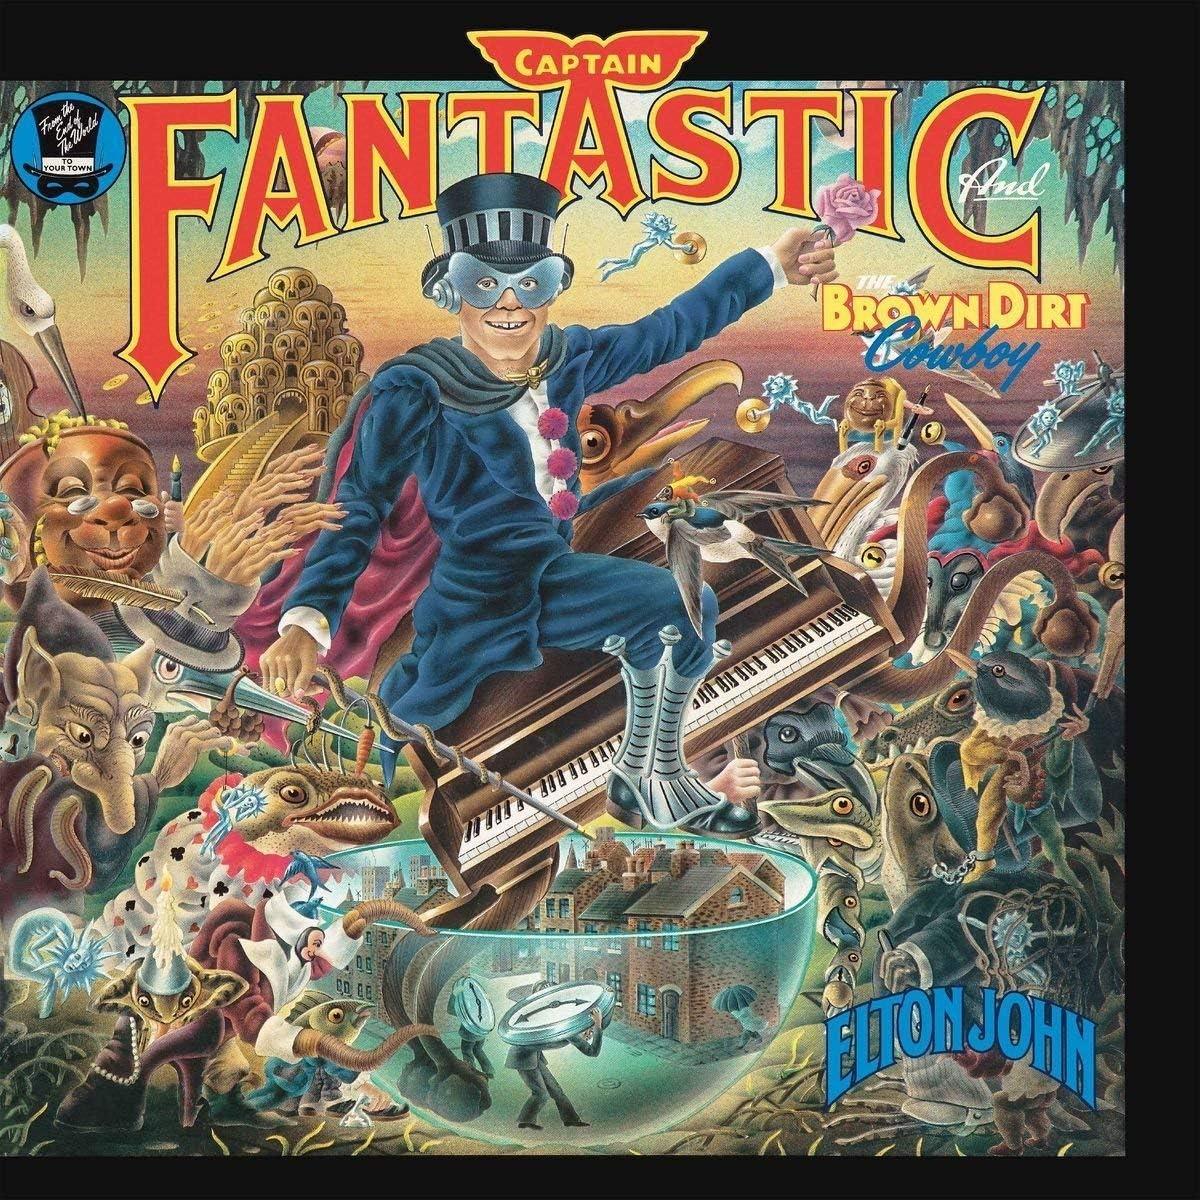 Captain Fantastic and The Brown Dirt Cowboy: Amazon.com.mx: Música